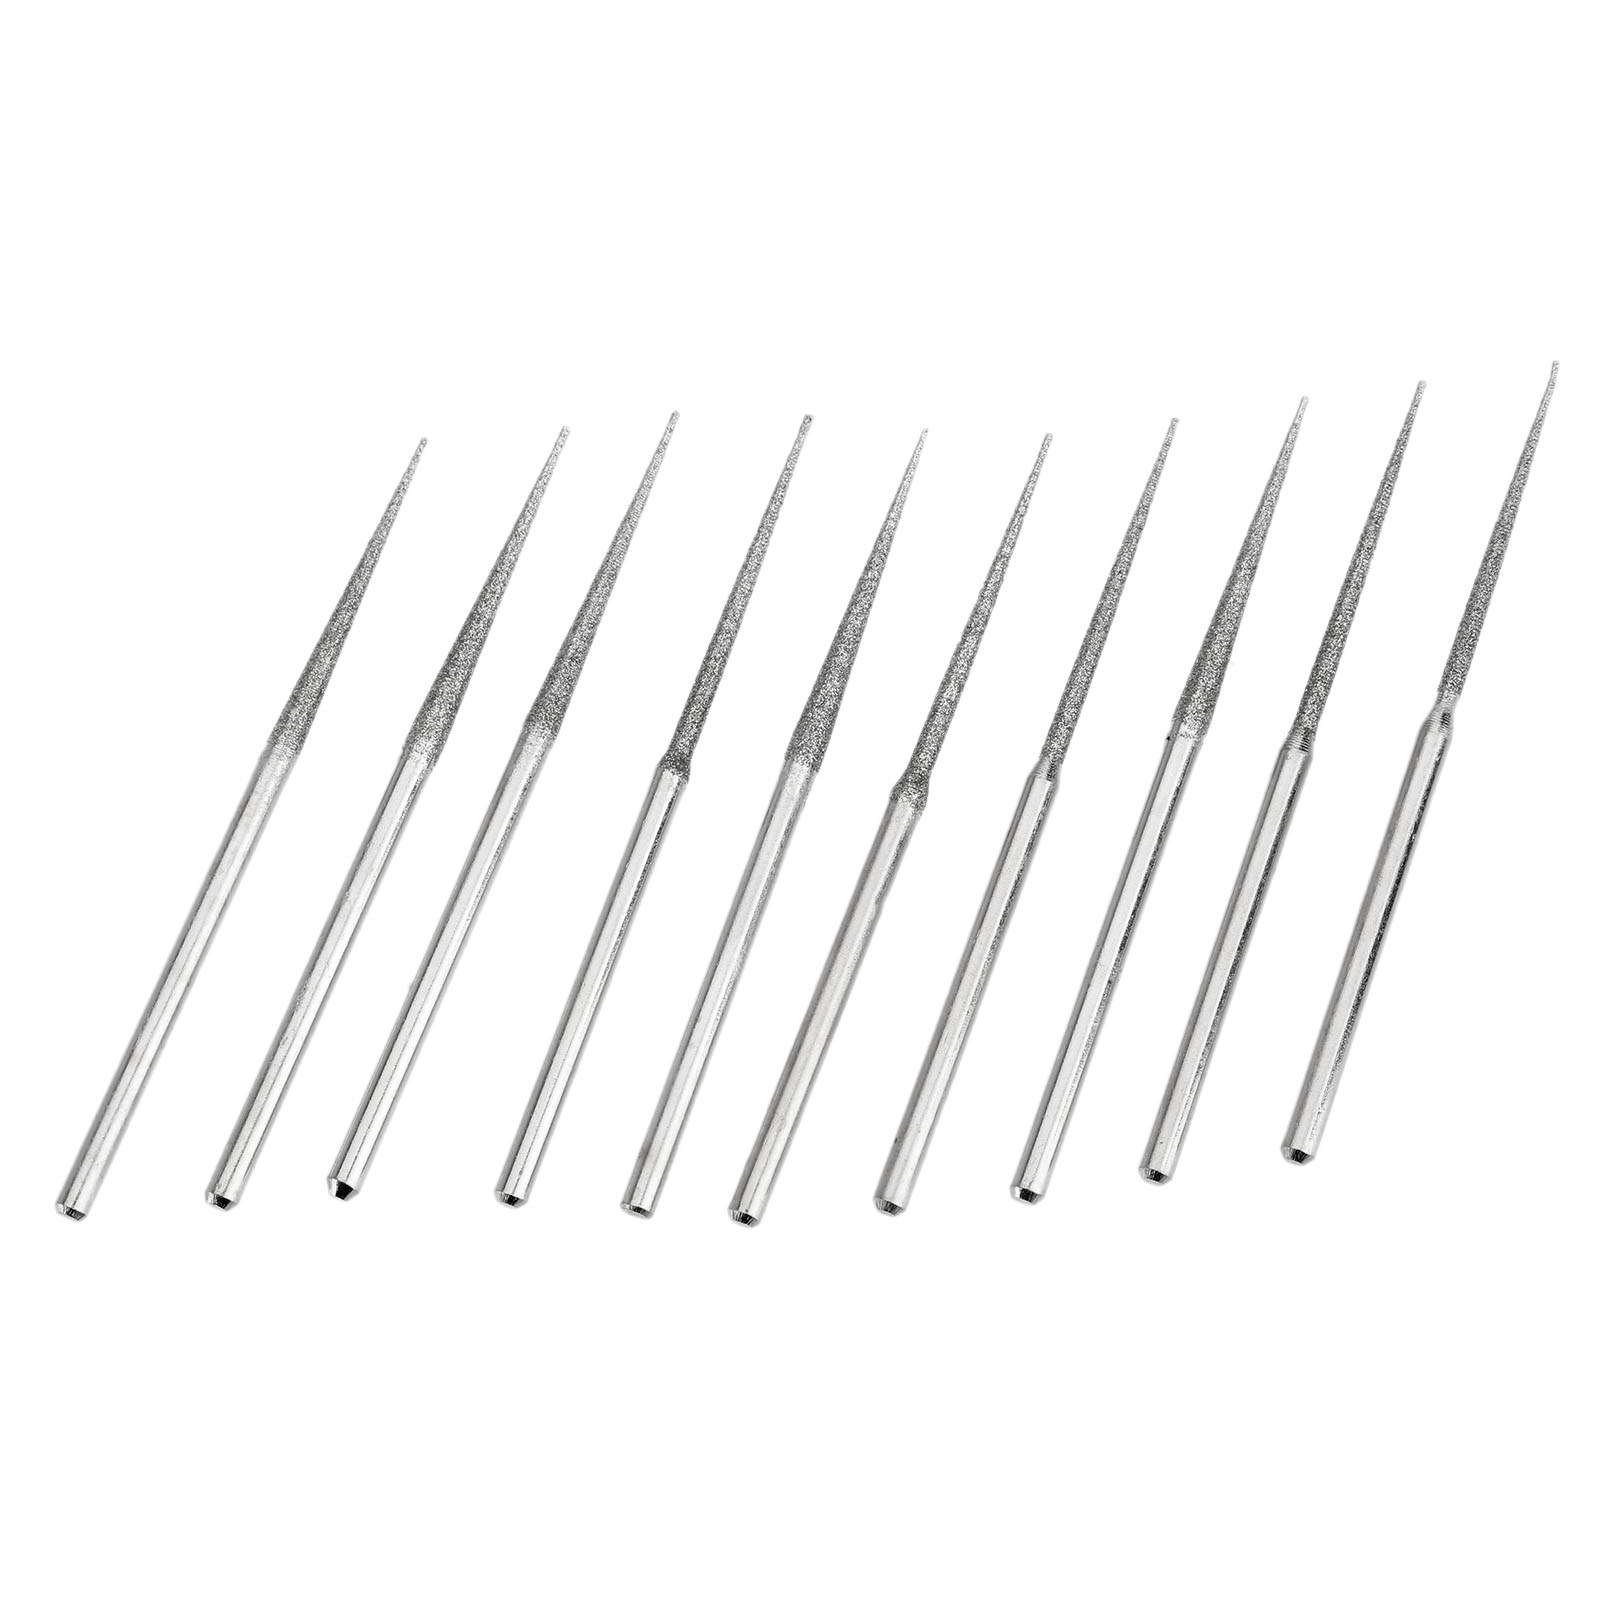 10Pcs Dremel Accesories Mini Drill Diamond Grinding Head Bur Bit Set Grinding Tool For Dremel Rotary Tool L-fine Tip 3mm Shank